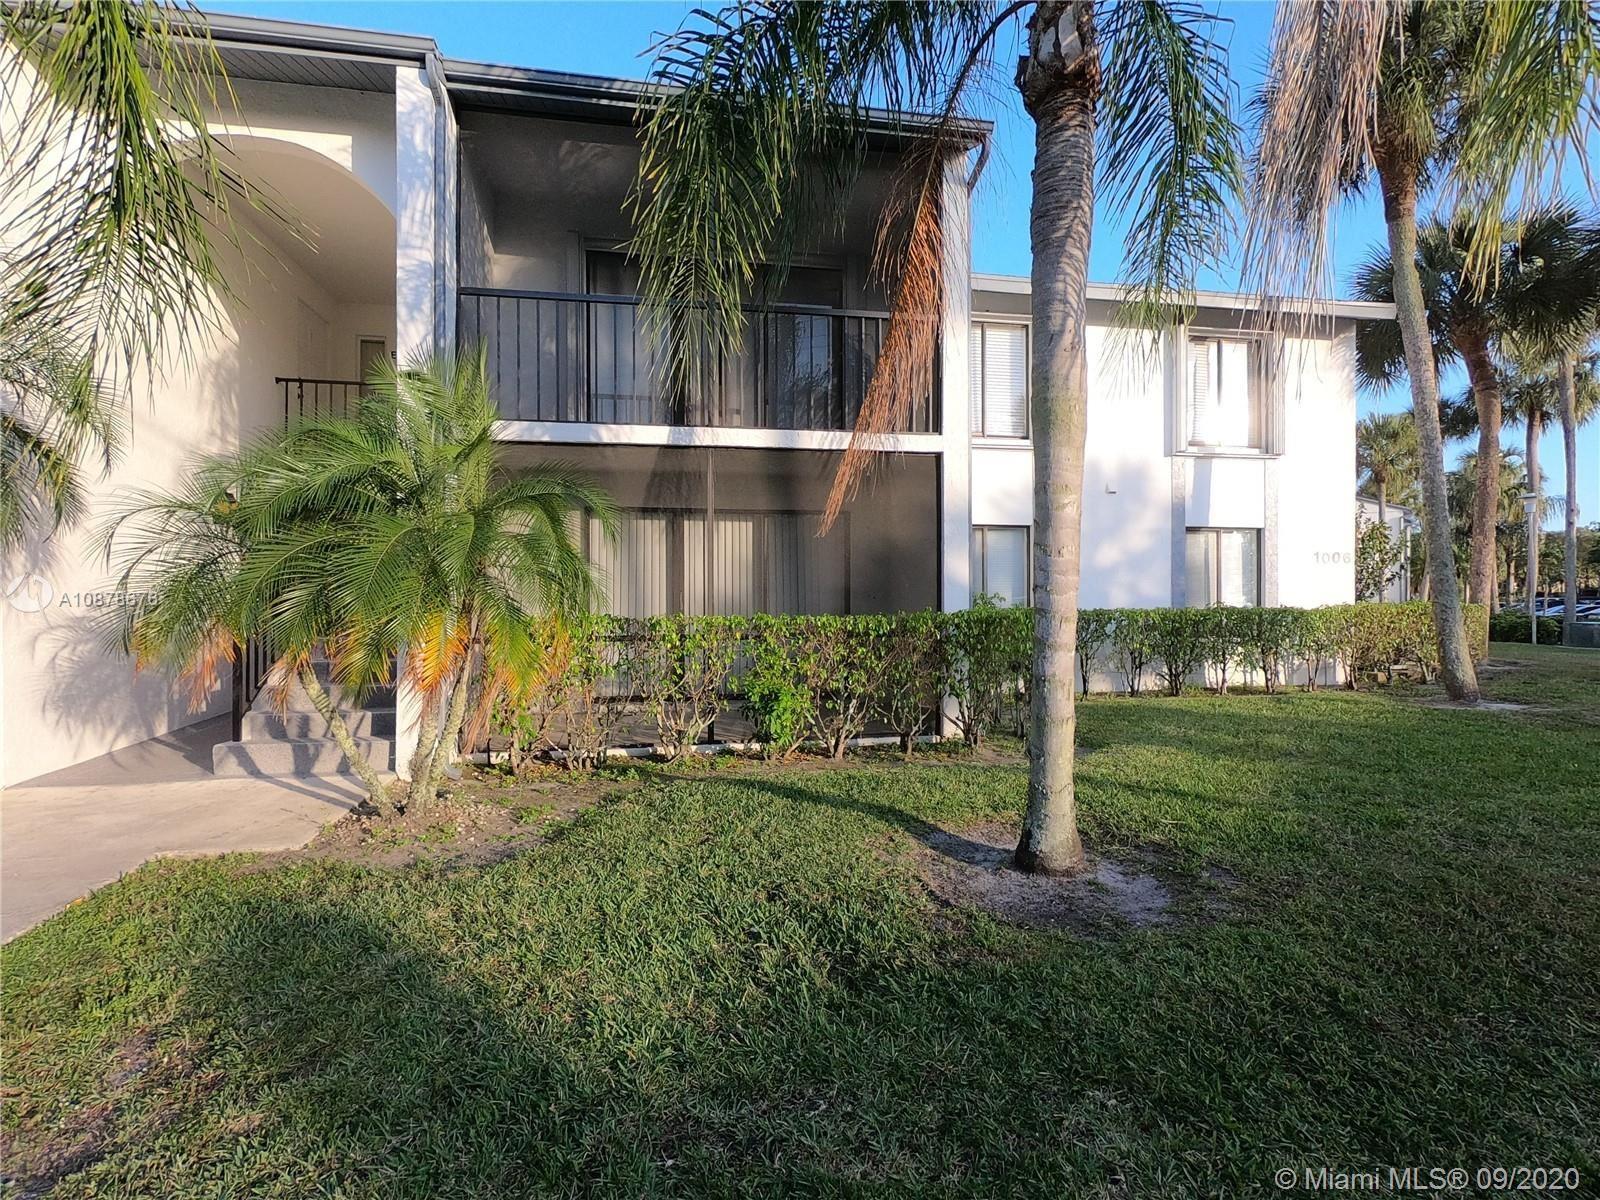 1006 Green Pine Blvd #H1, West Palm Beach, FL 33409 - #: A10878676